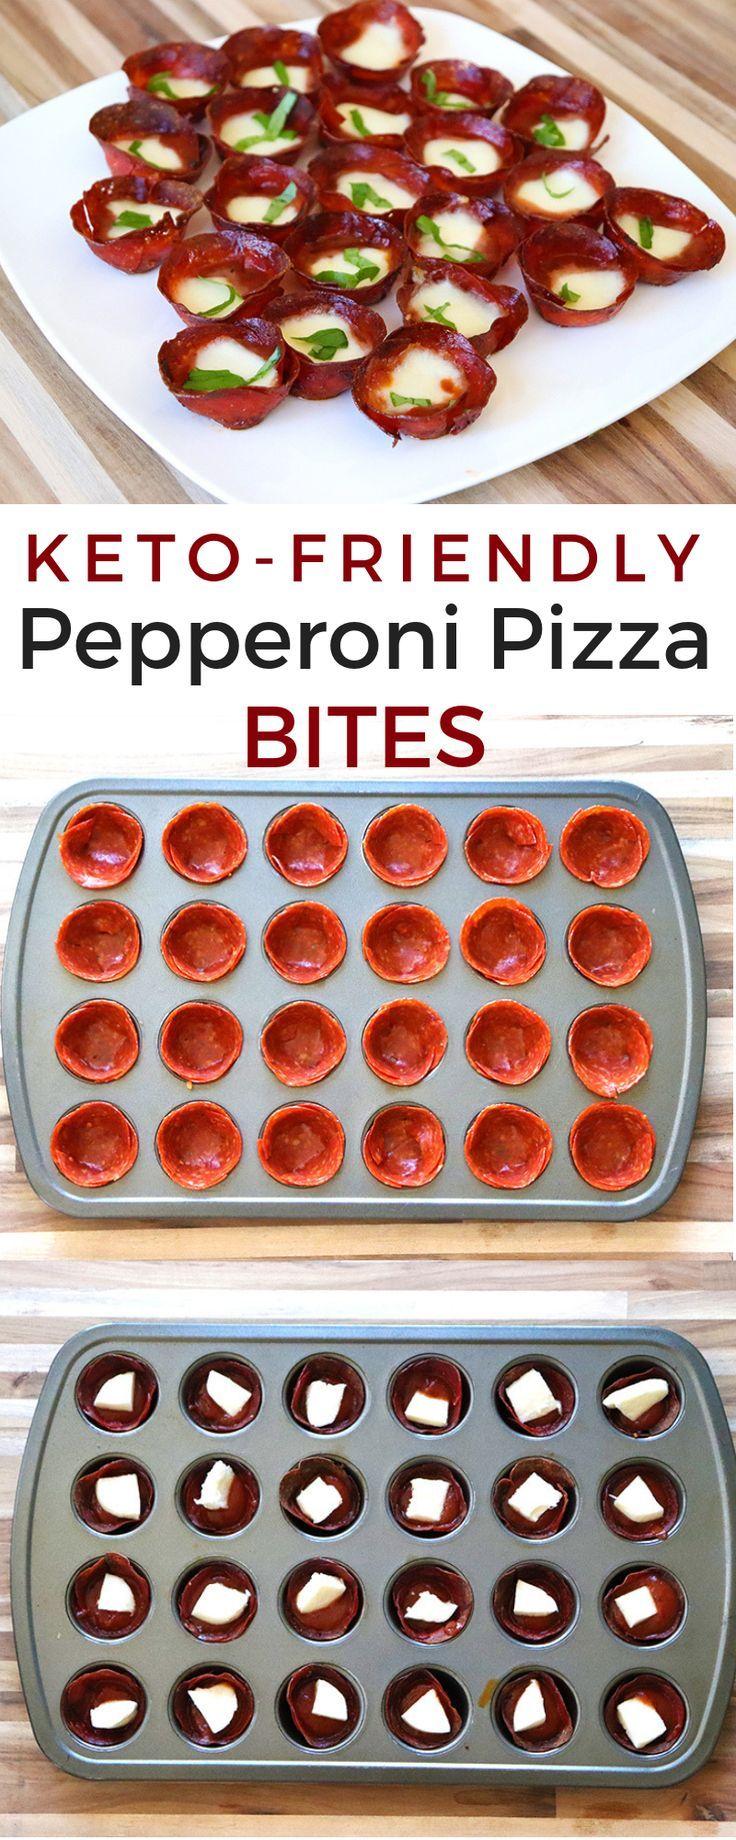 Photo of Keto Pepperoni Pizza Bites 0 Net Carbs